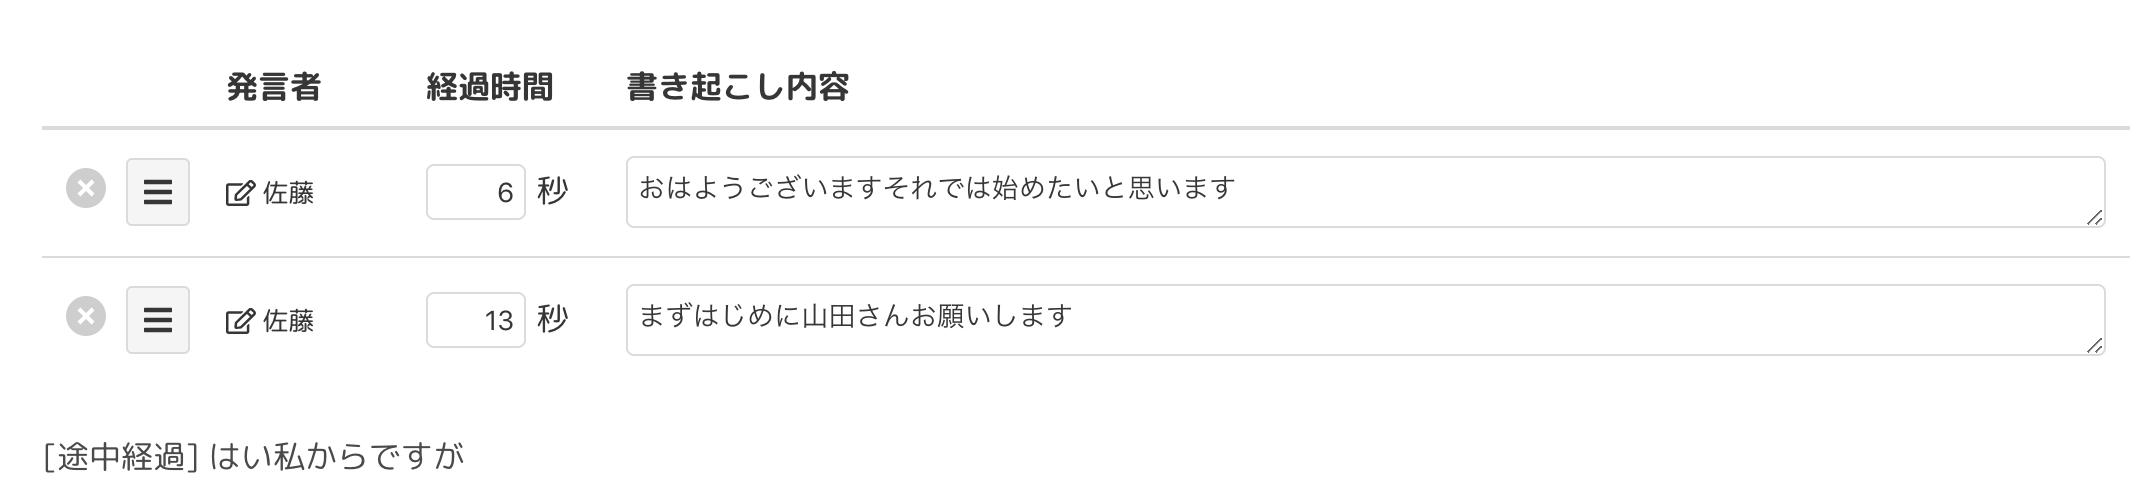 sample01.0fa31a2.png